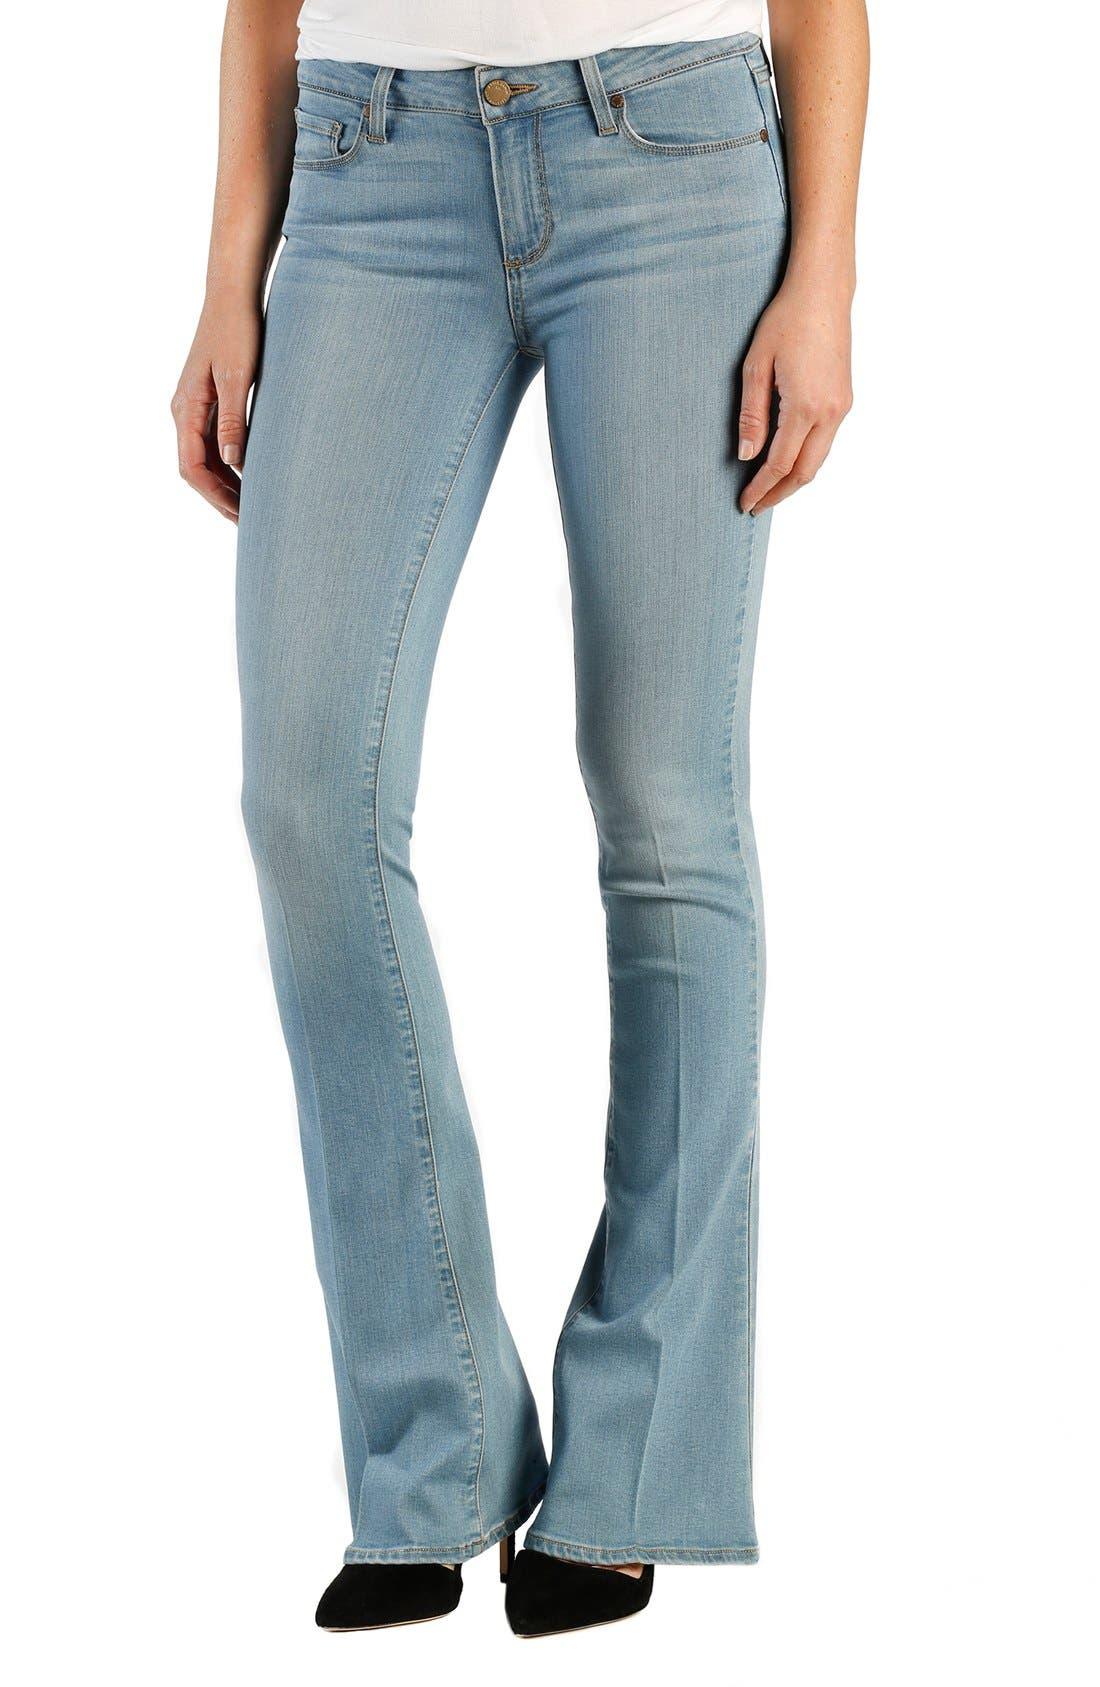 Paige Denim Transcend Lou Lou Flare Jeans Abel Petite